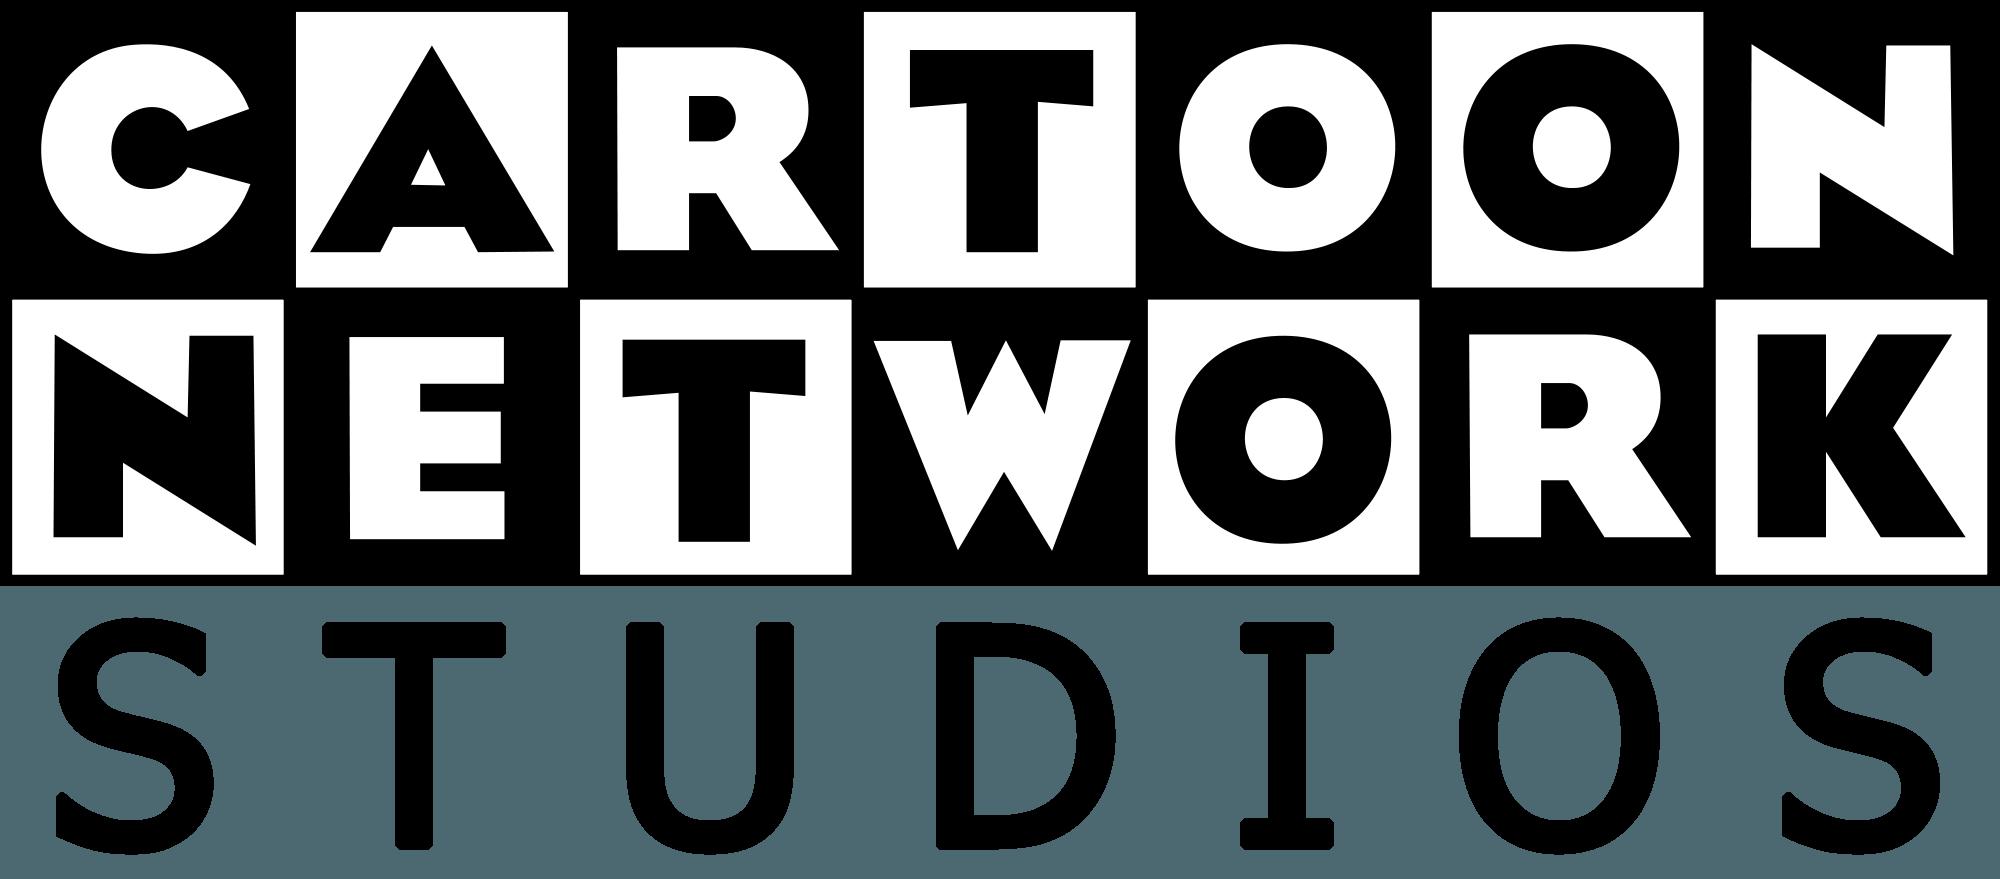 Cartoon Network 2000 Logo Logodix